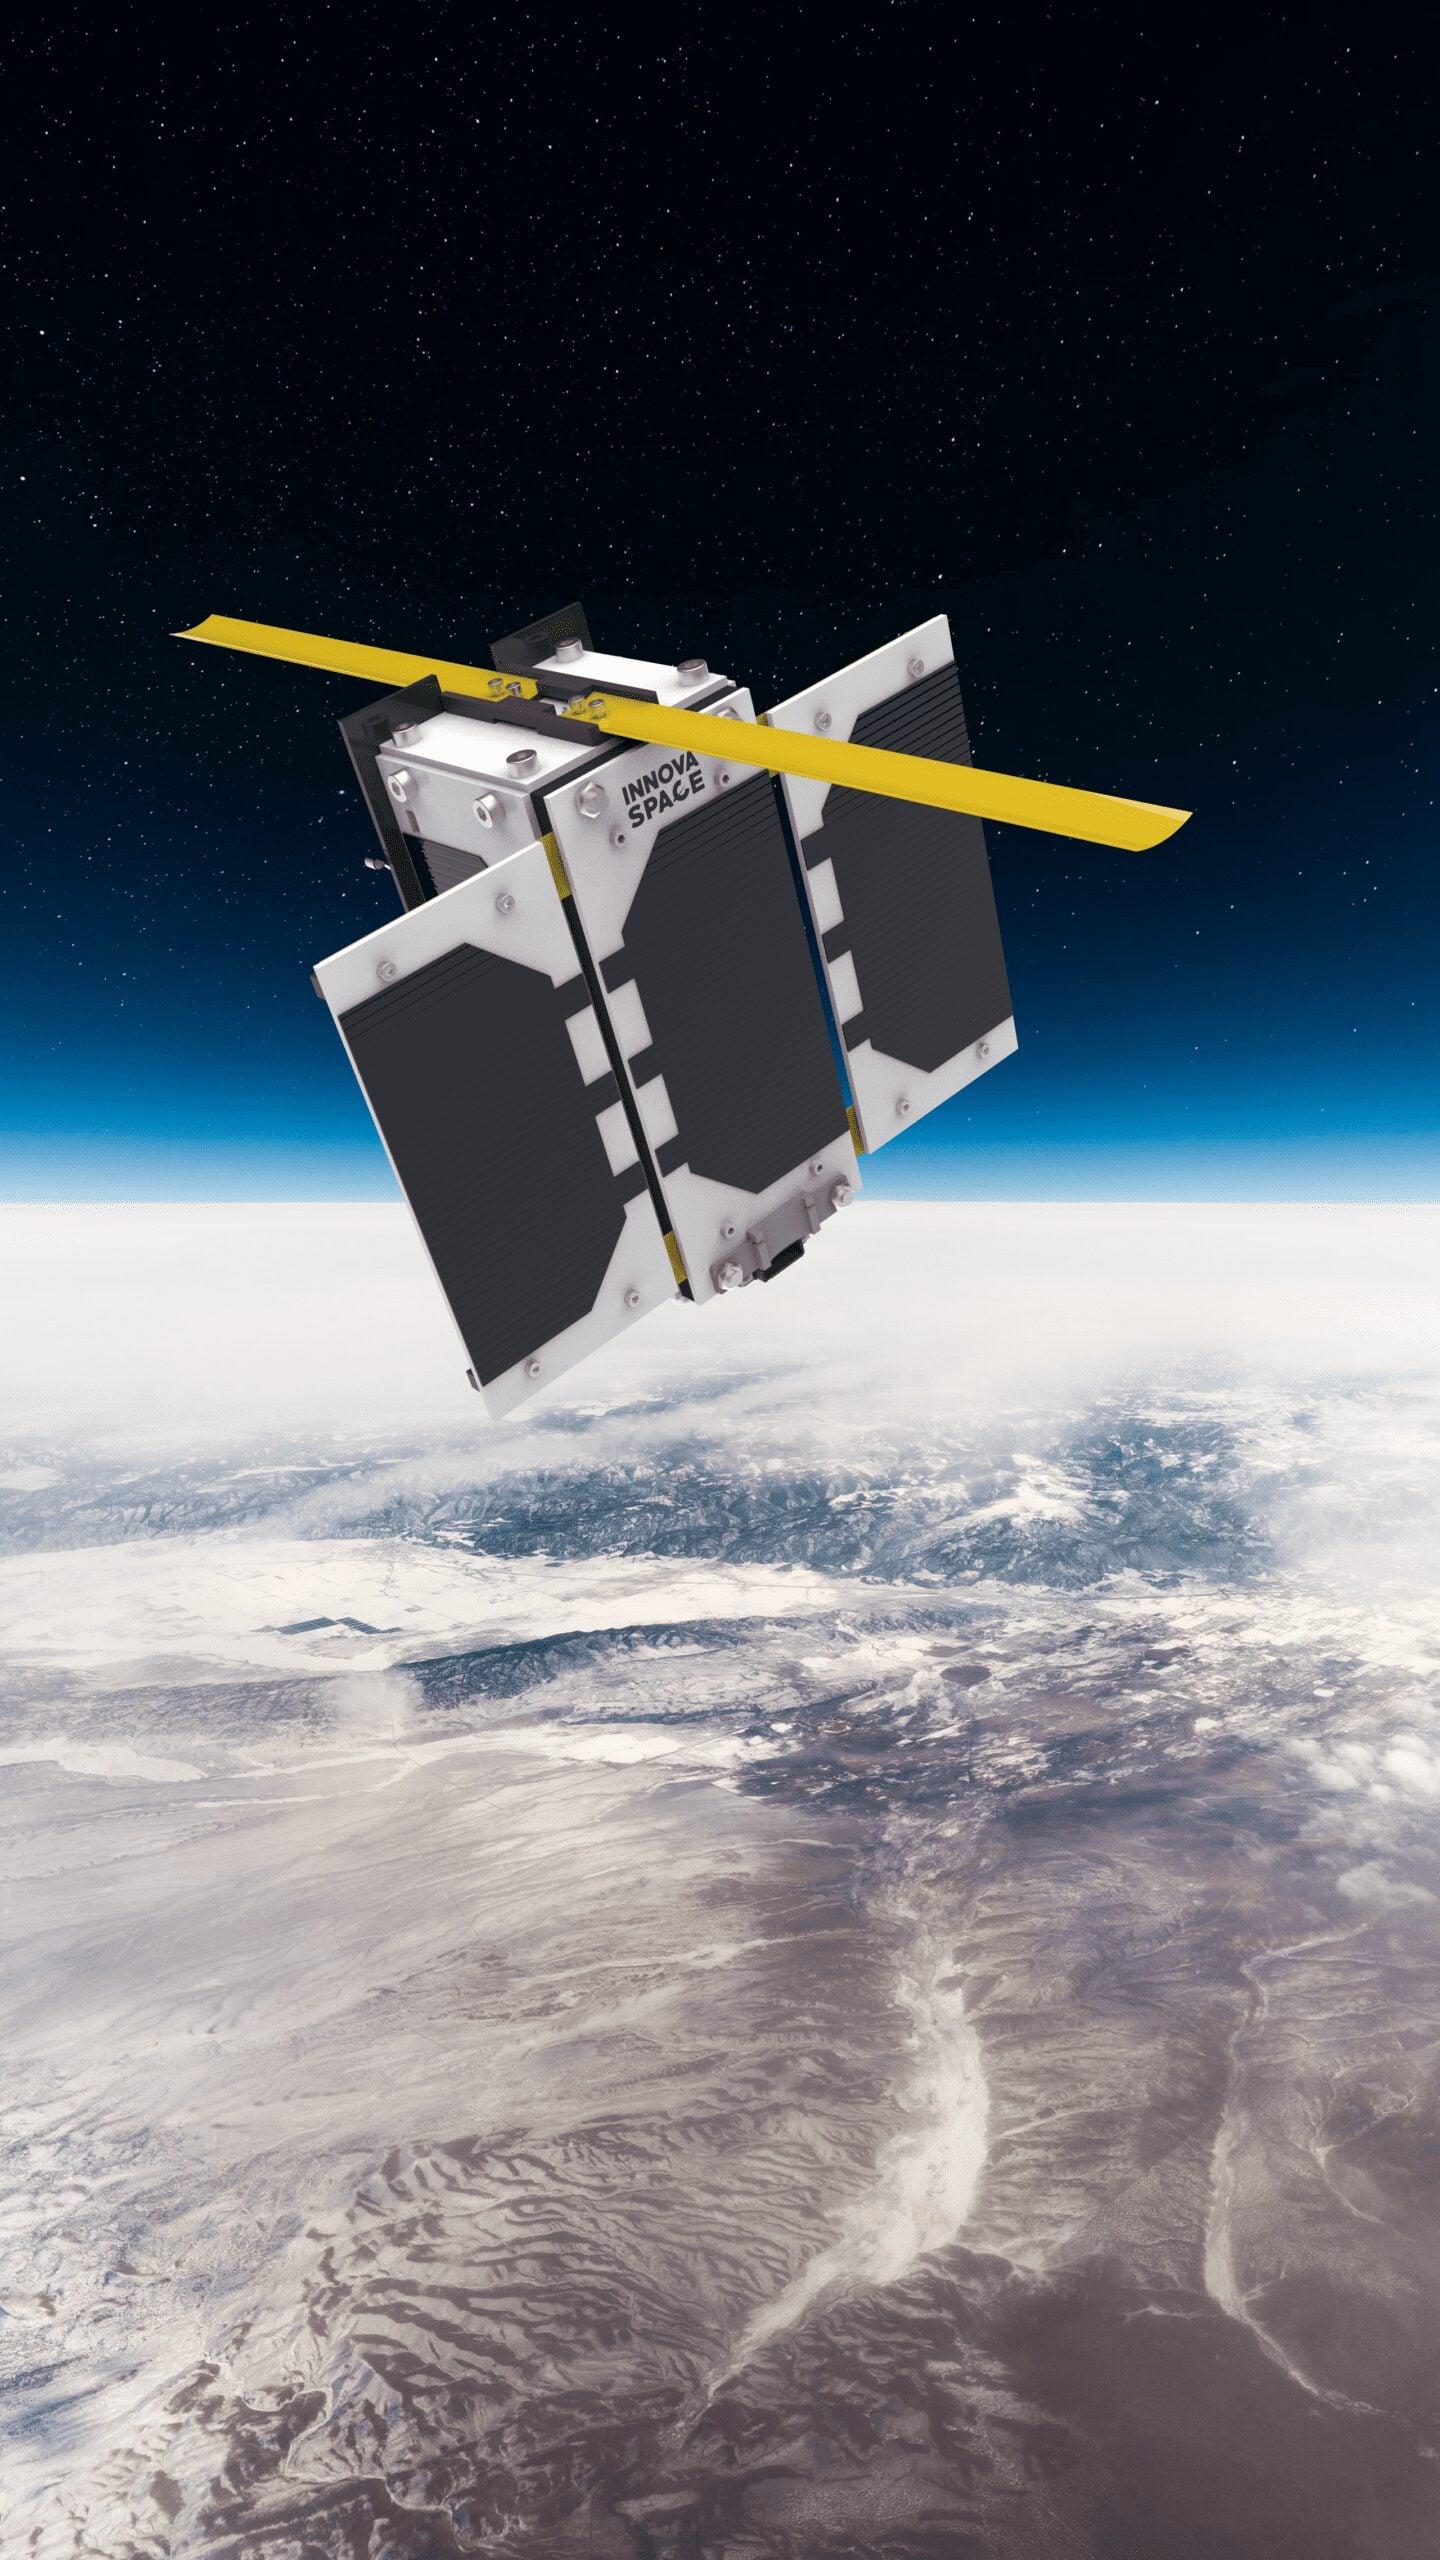 satélite spacex argentina innova